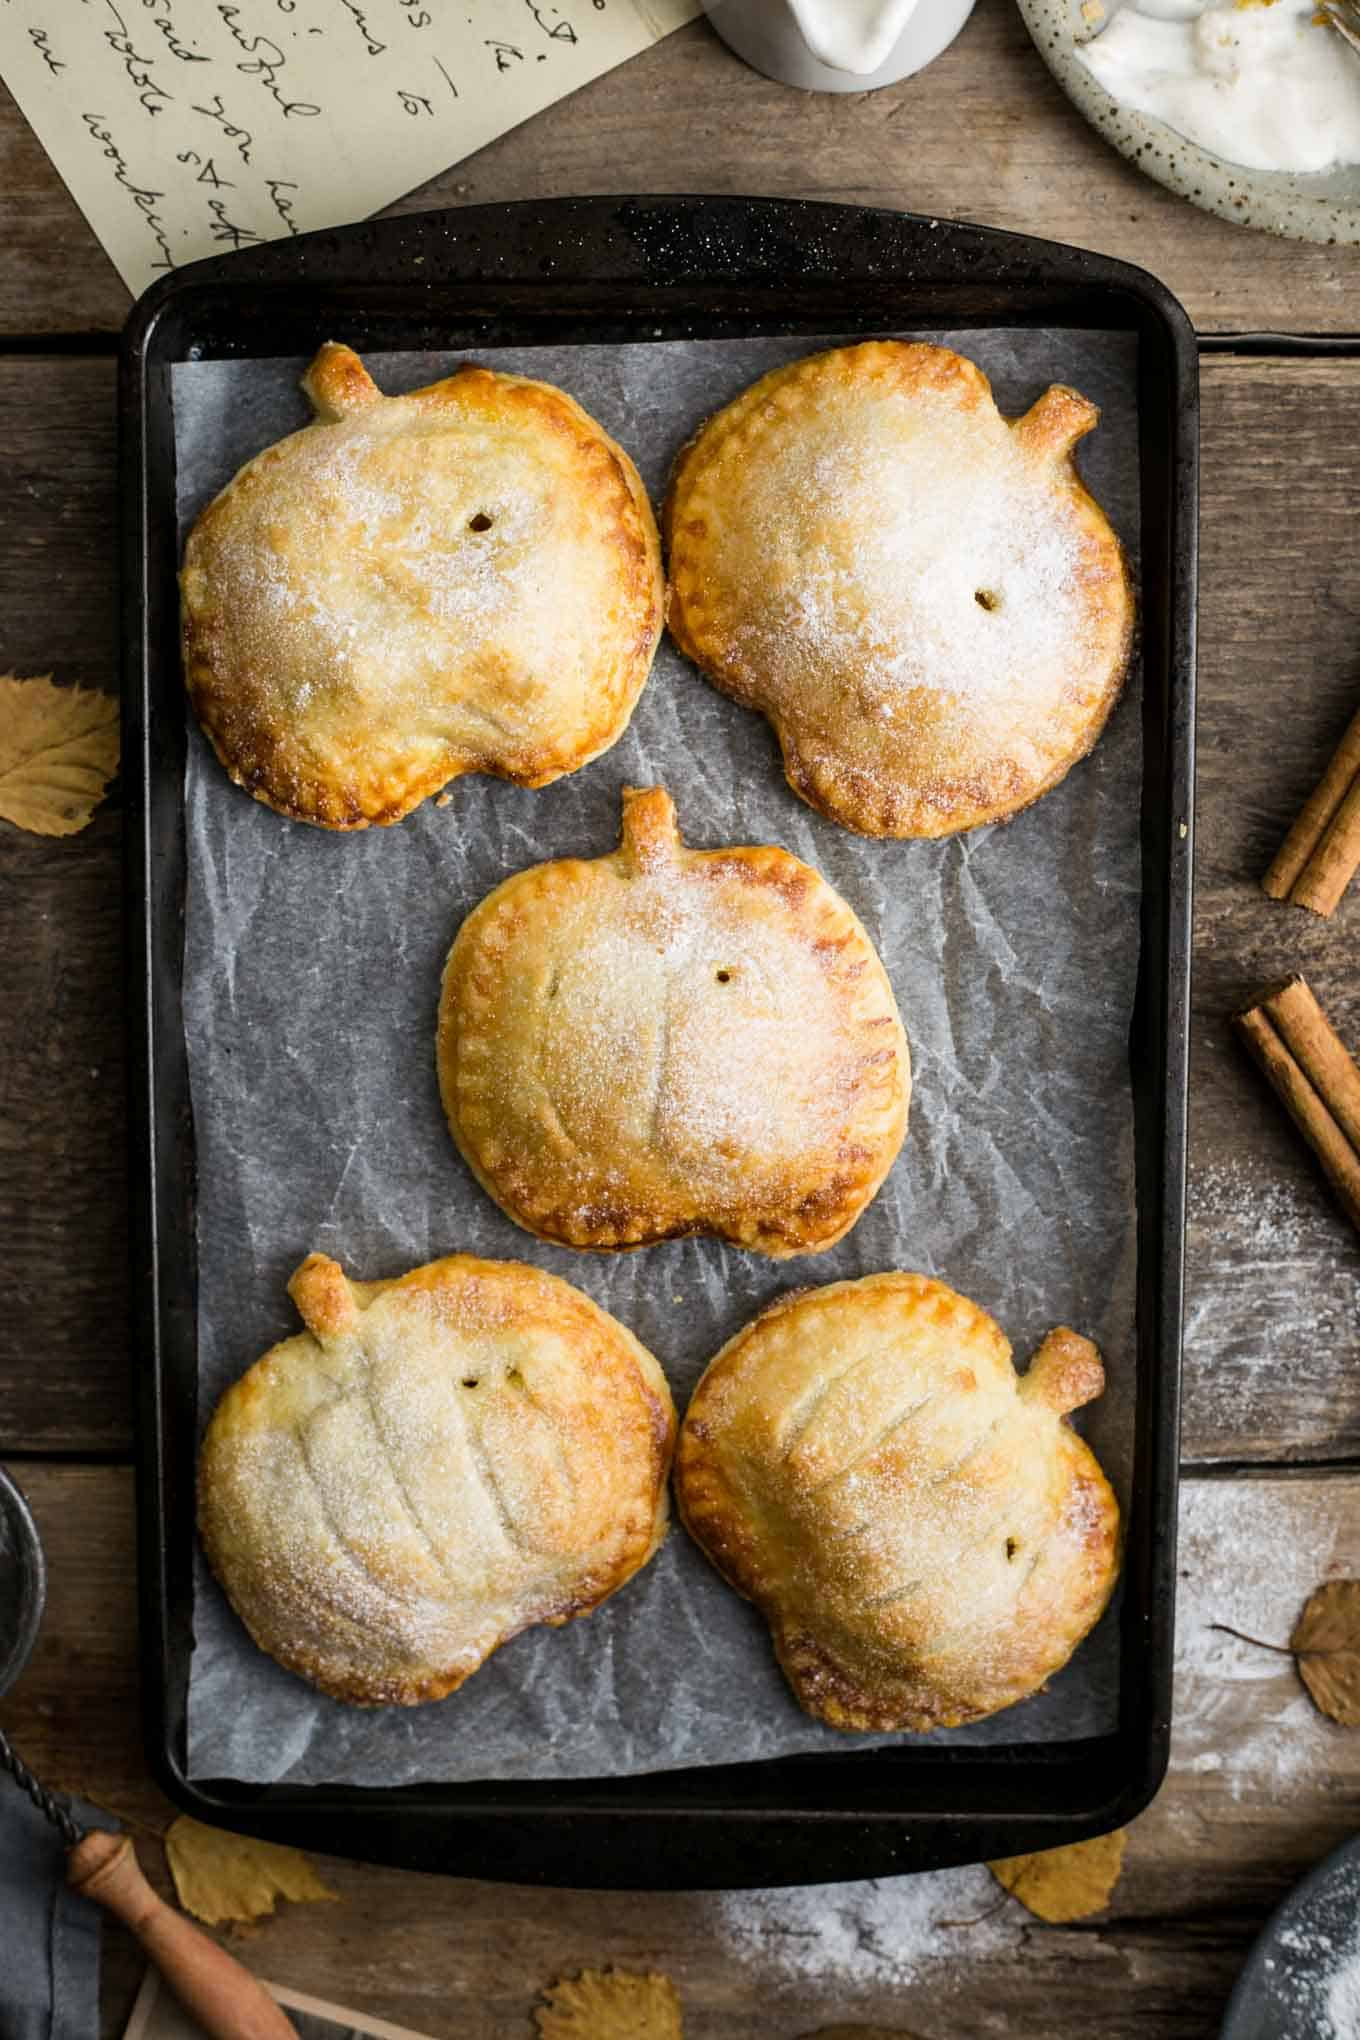 Spiced apple hand pies with pumpkin #vegan #applepie   via @annabanana.co